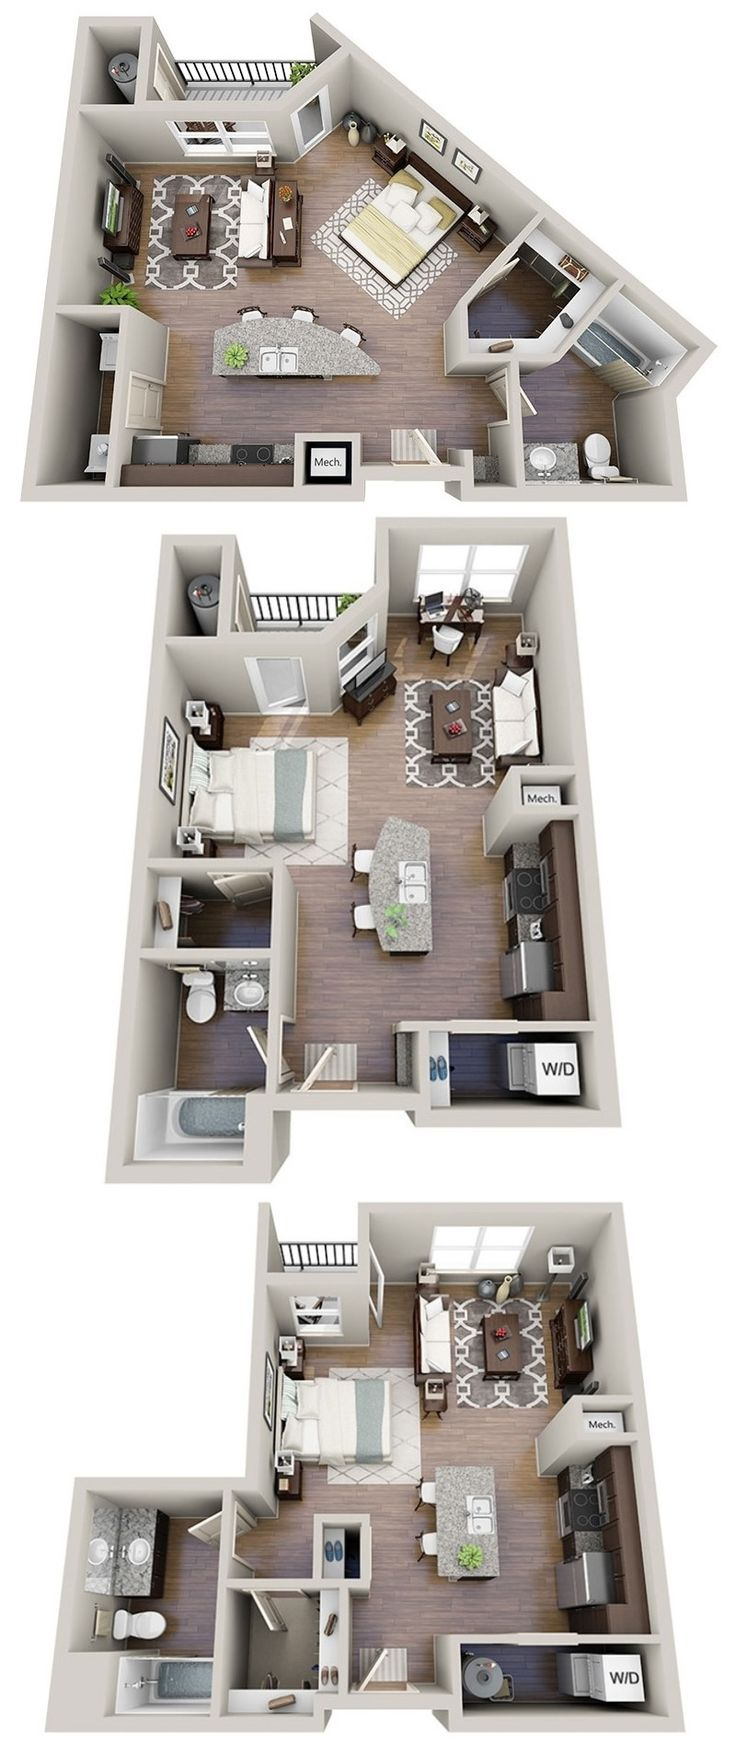 Best 25 Studio apartment floor plans ideas on Pinterest  Small apartment plans Studio